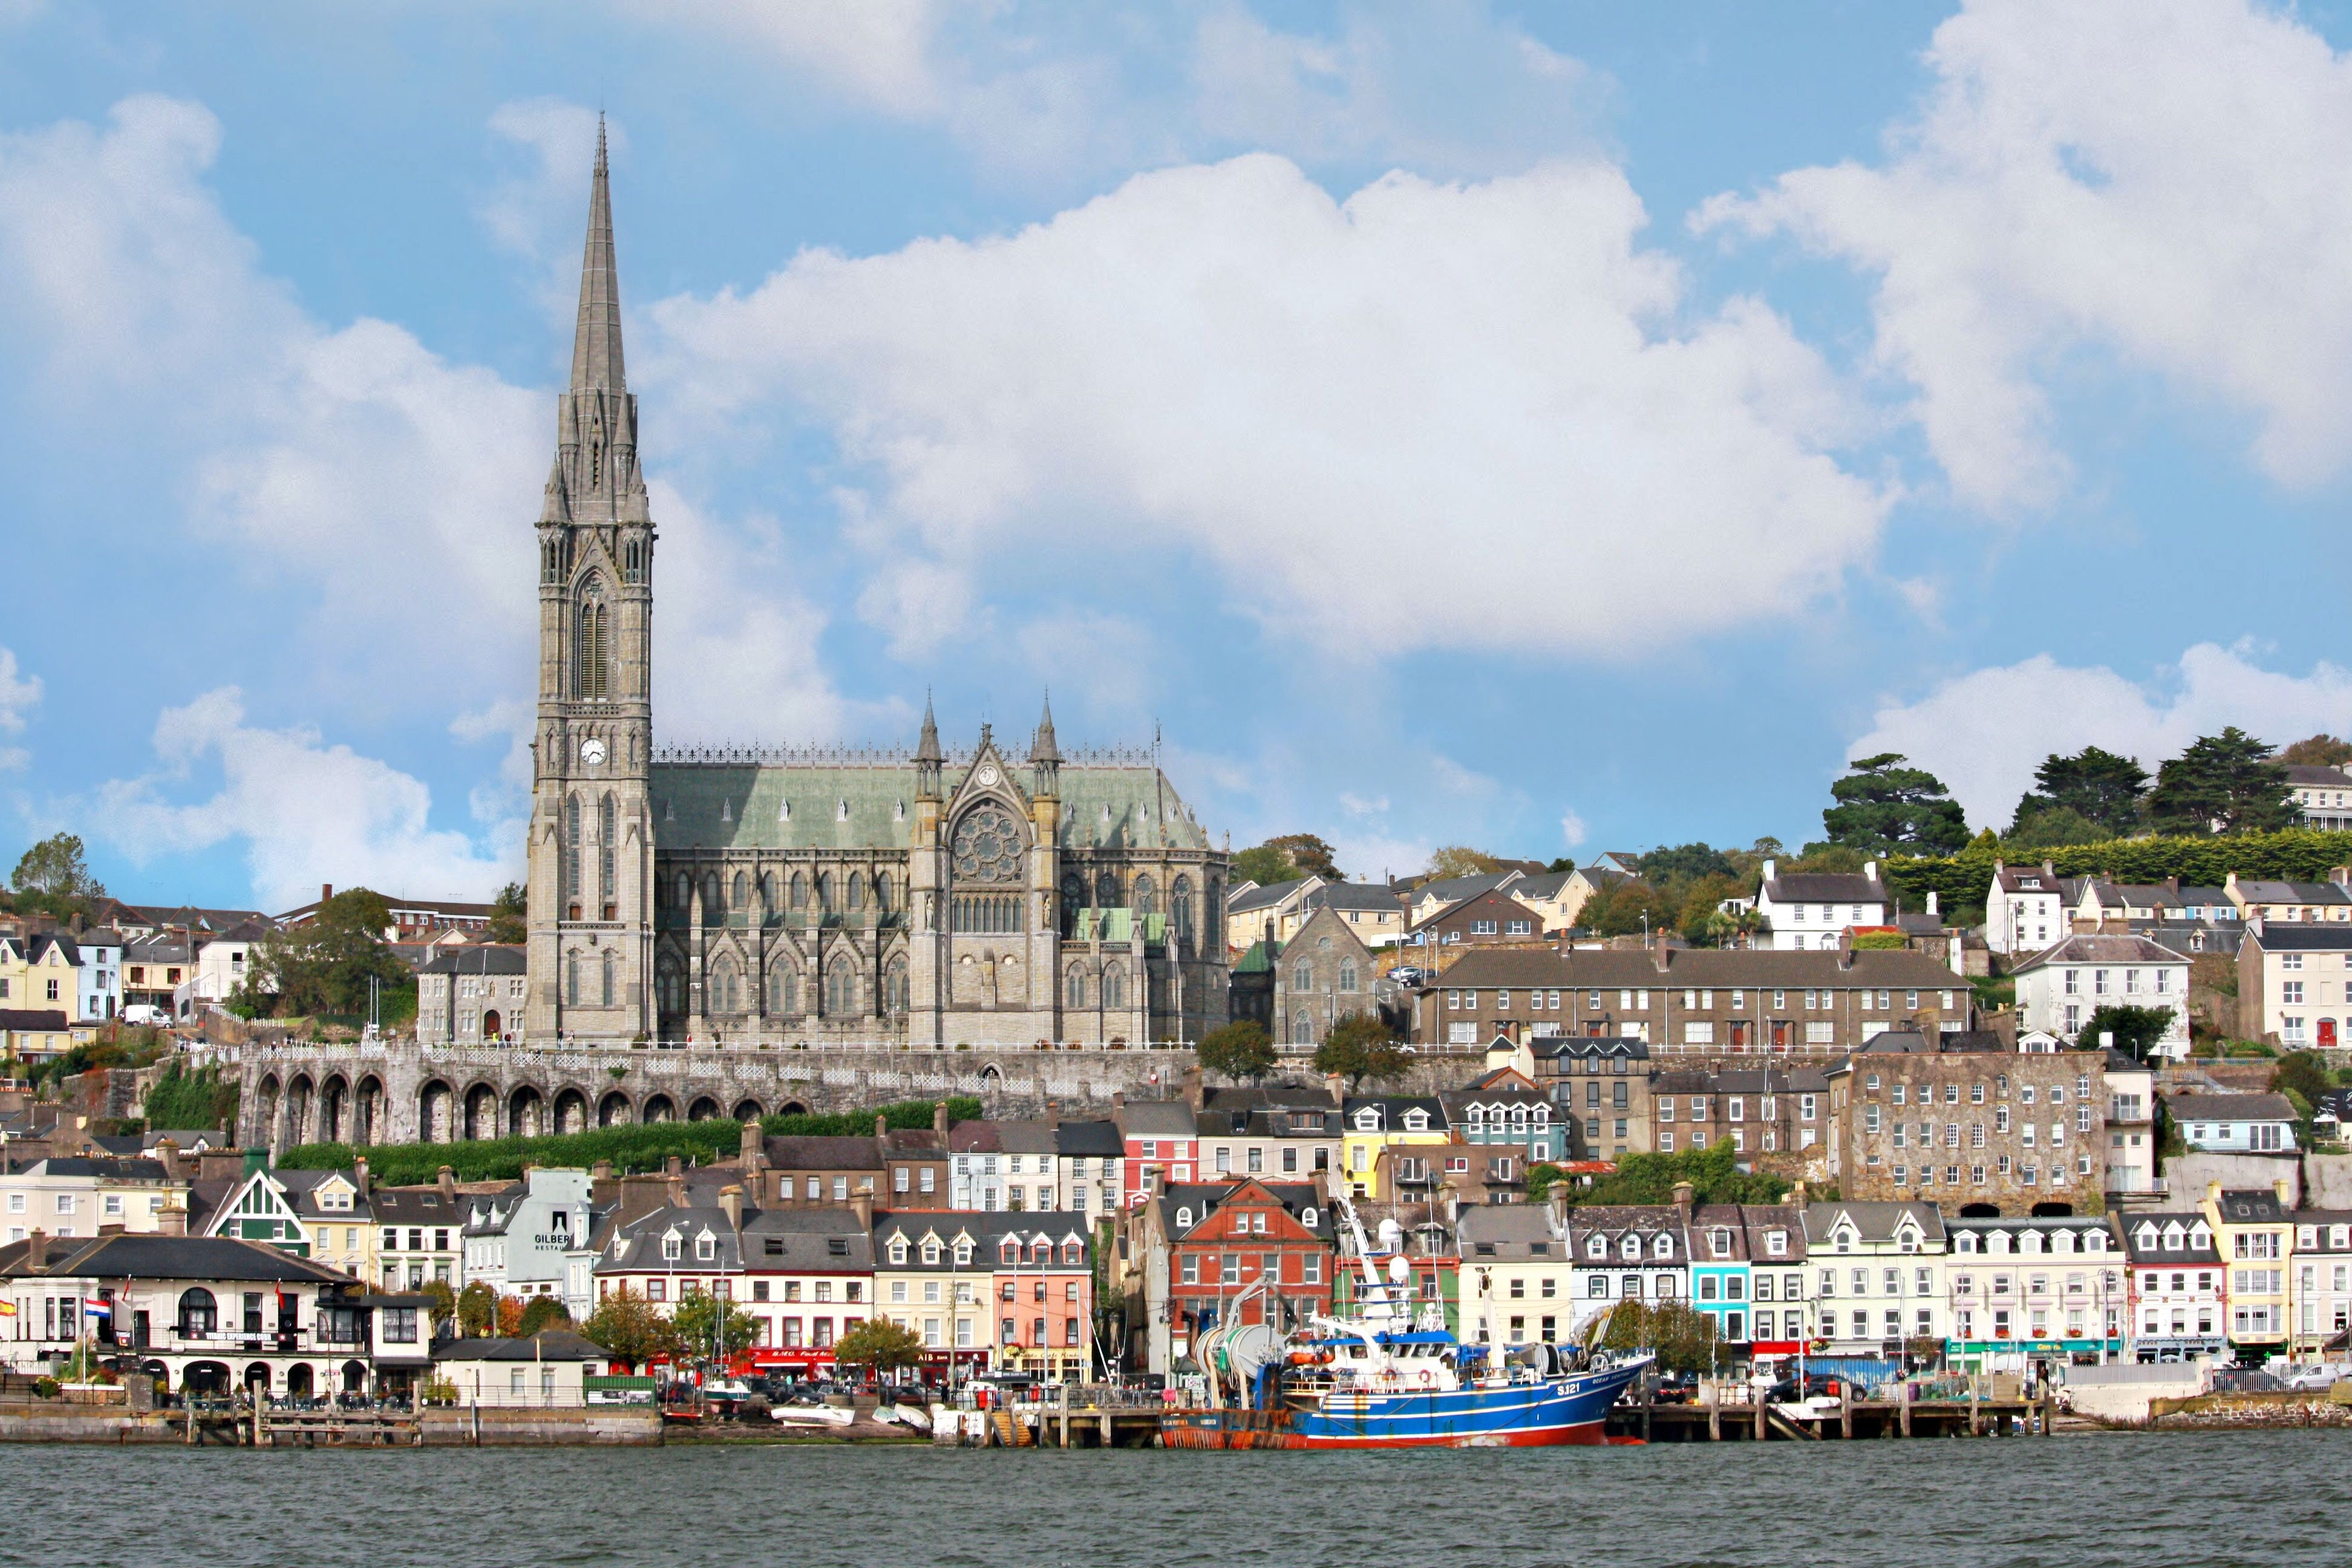 Image of the skyline in Cobh, Ireland